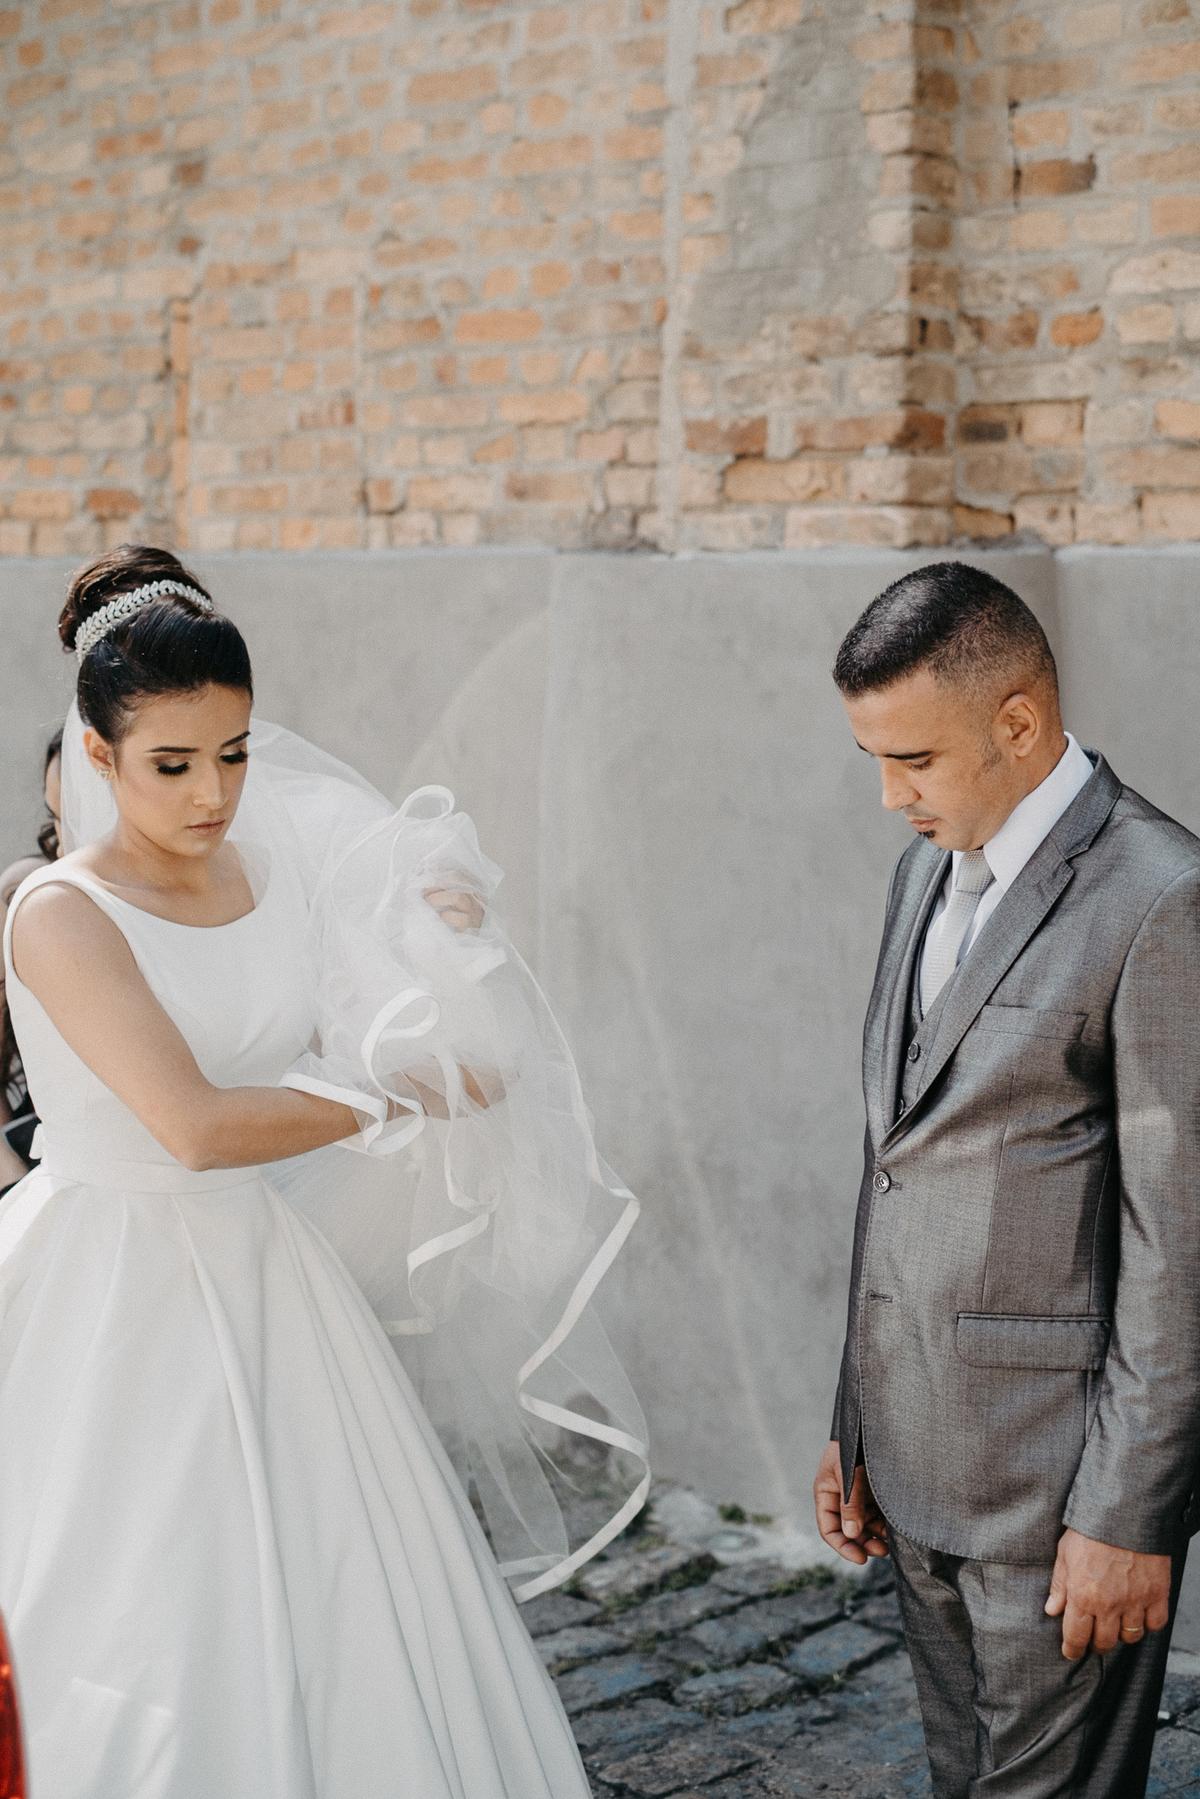 entrada da noiva casamentos de dia casar no campo ao ar livre fotografos de casamento fotos por caio henrique